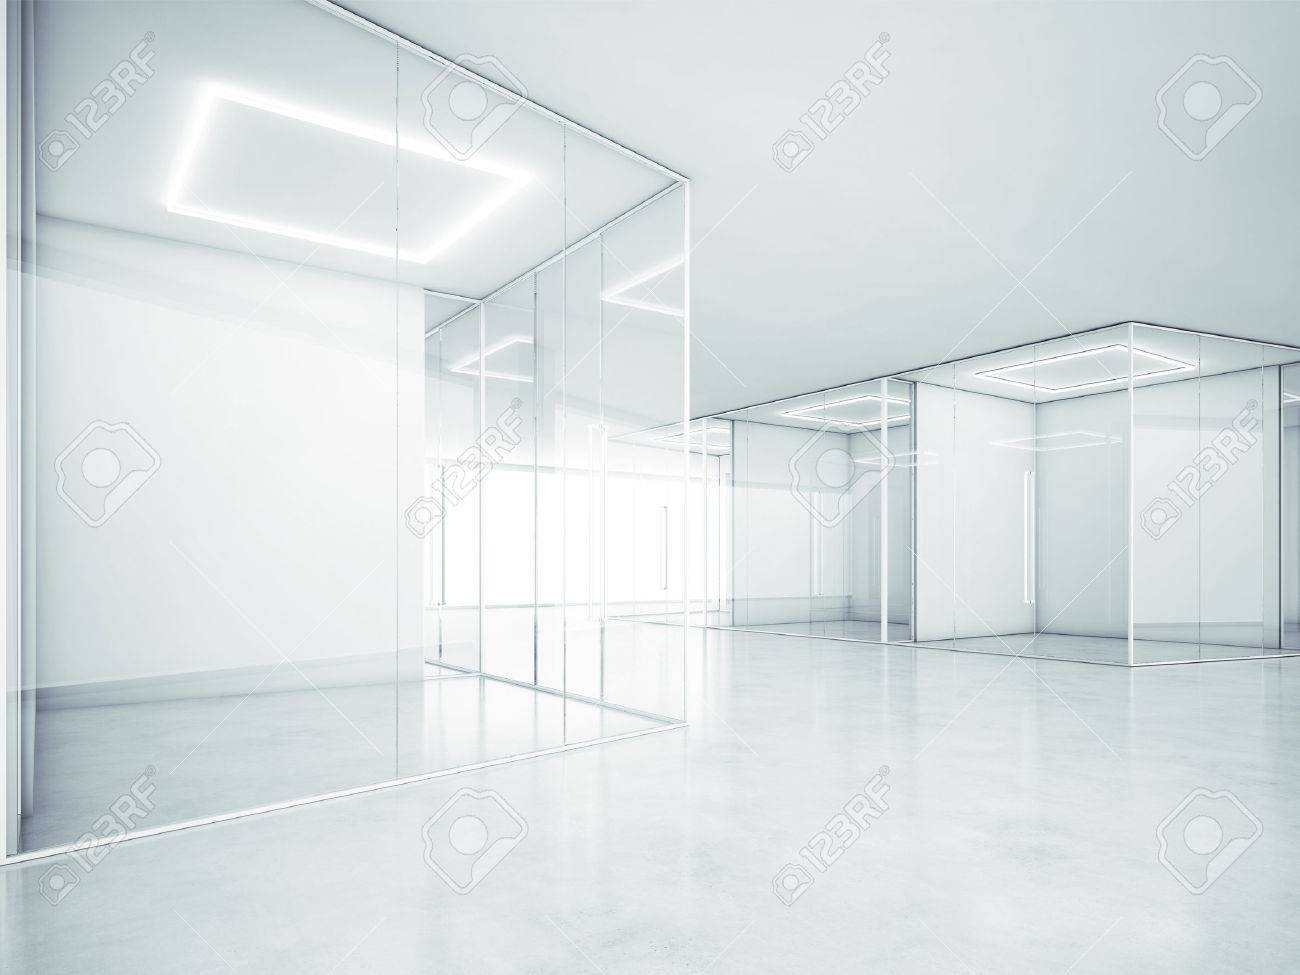 white office interior.  Office Stock Photo  White Office Interior 3D Rendering Inside Office Interior F